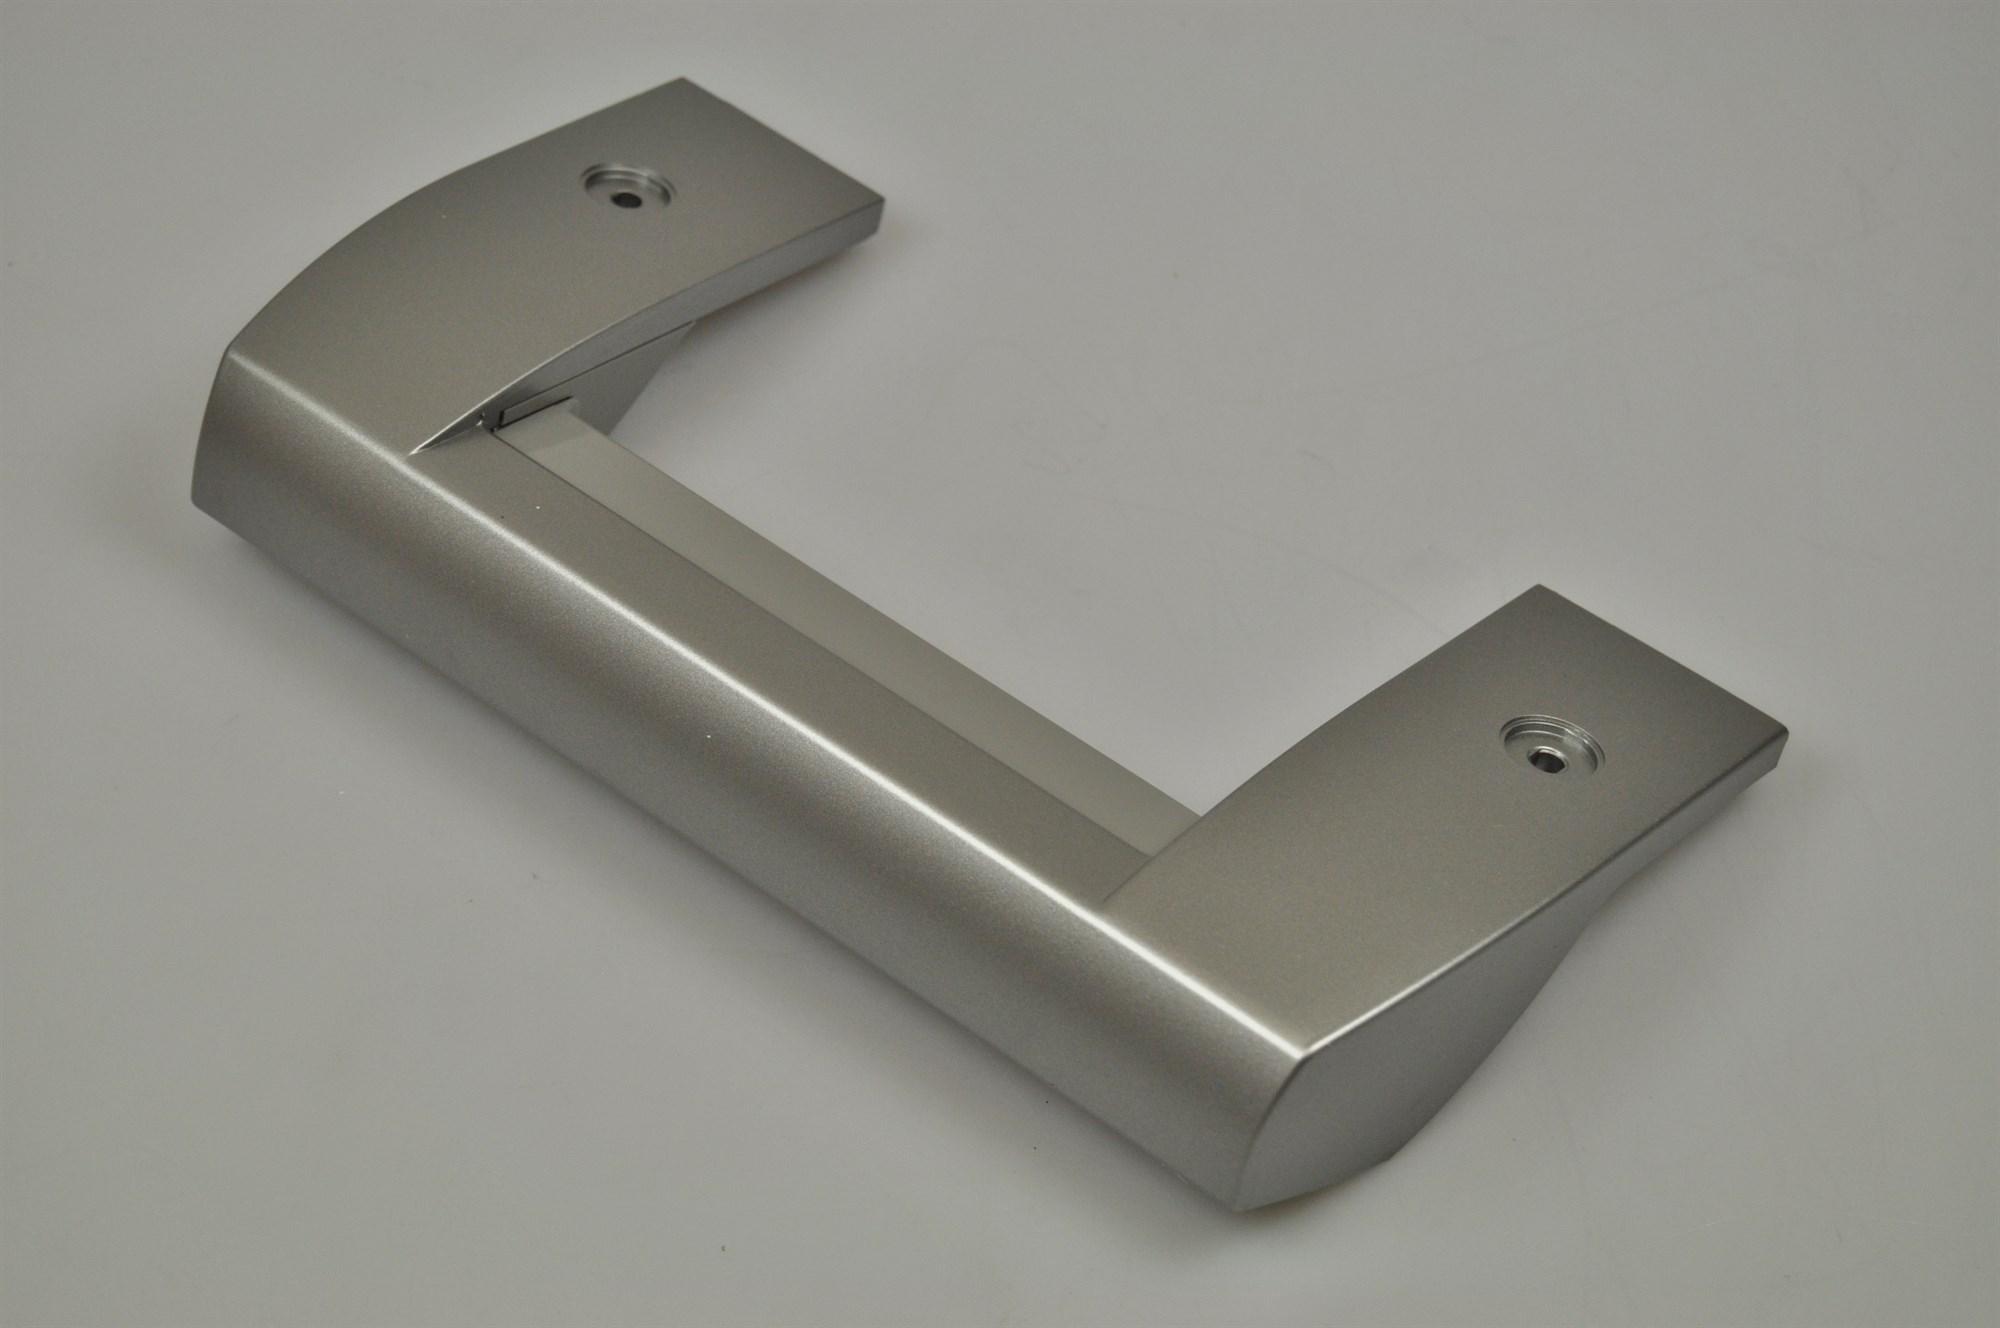 Gorenje Kühlschrank Abtauautomatik : Griff gorenje side by side kühlschrank